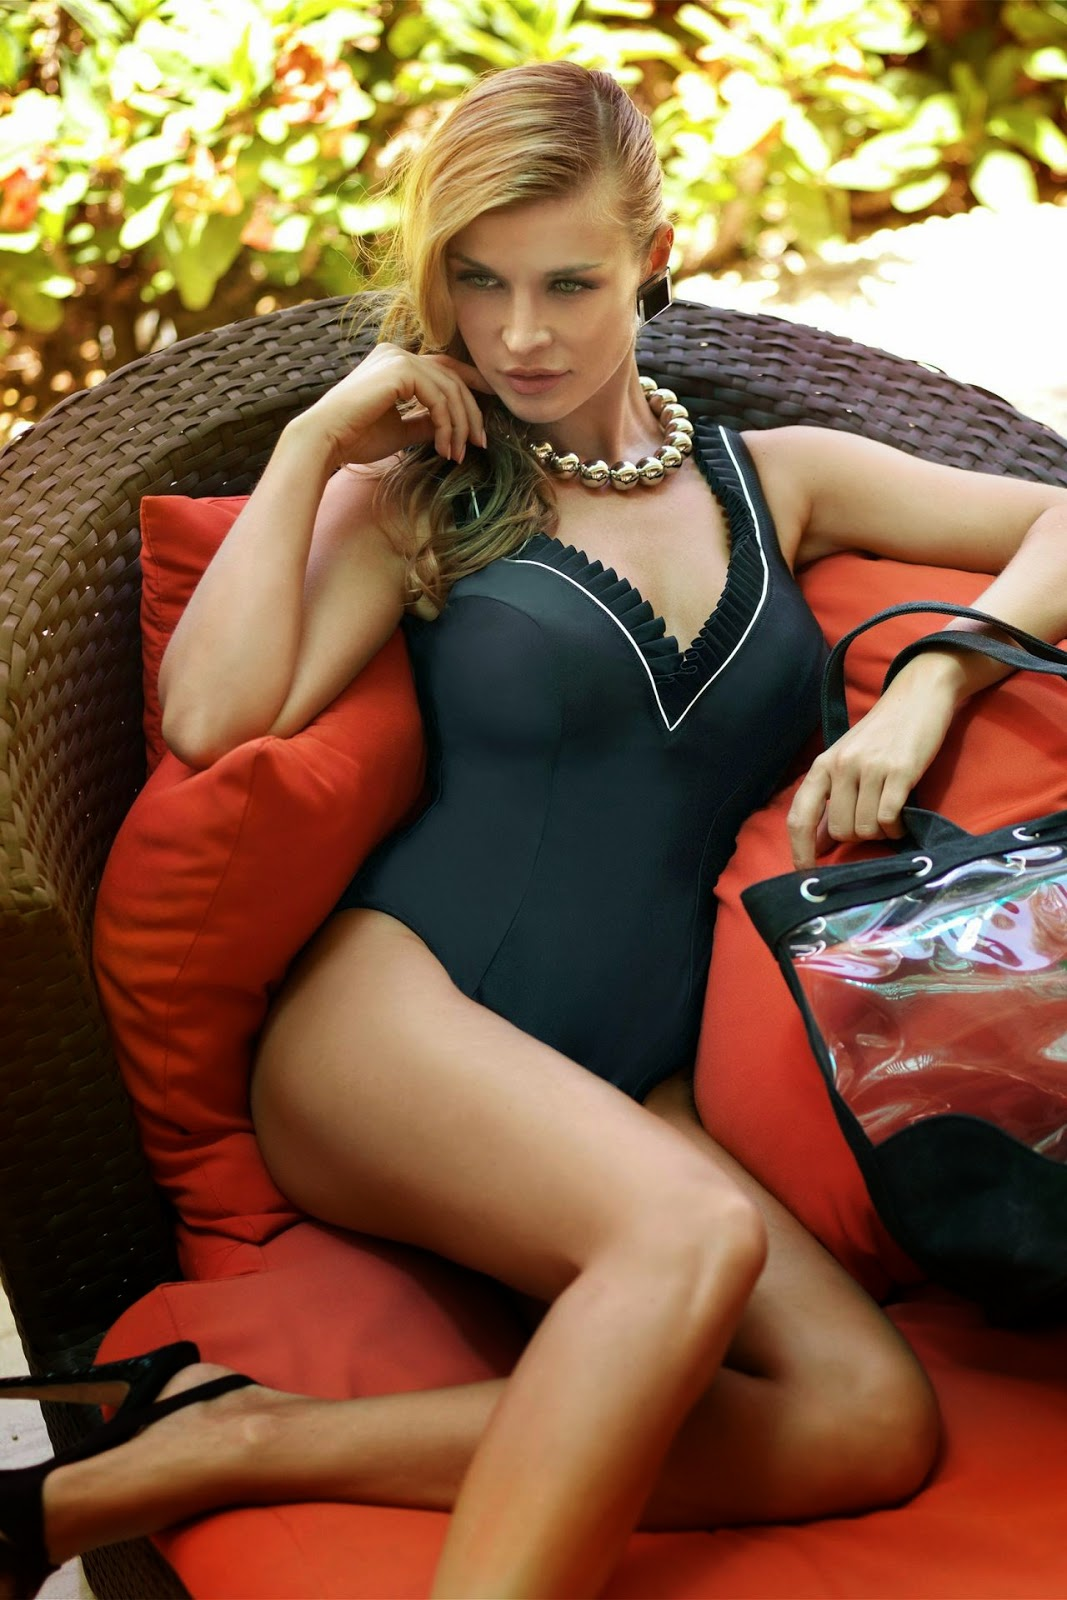 Bikiniworld Swimwear 2014 Lookbook featuring Joanna Krupa